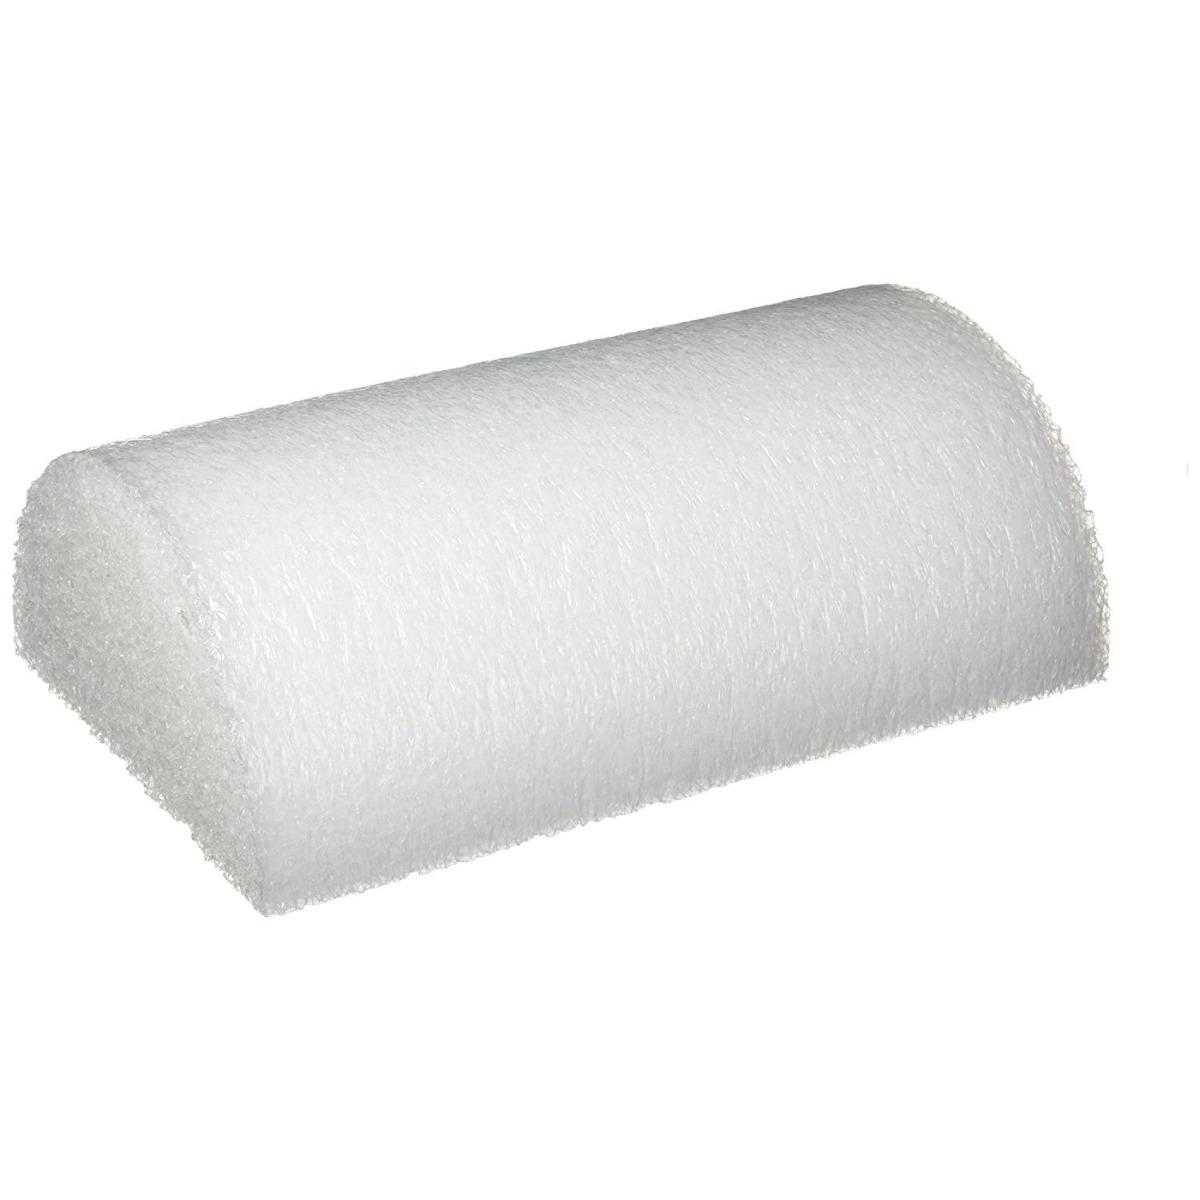 "Sammons Preston Foam Therapy Rolls, 6"" x 12"", Round"